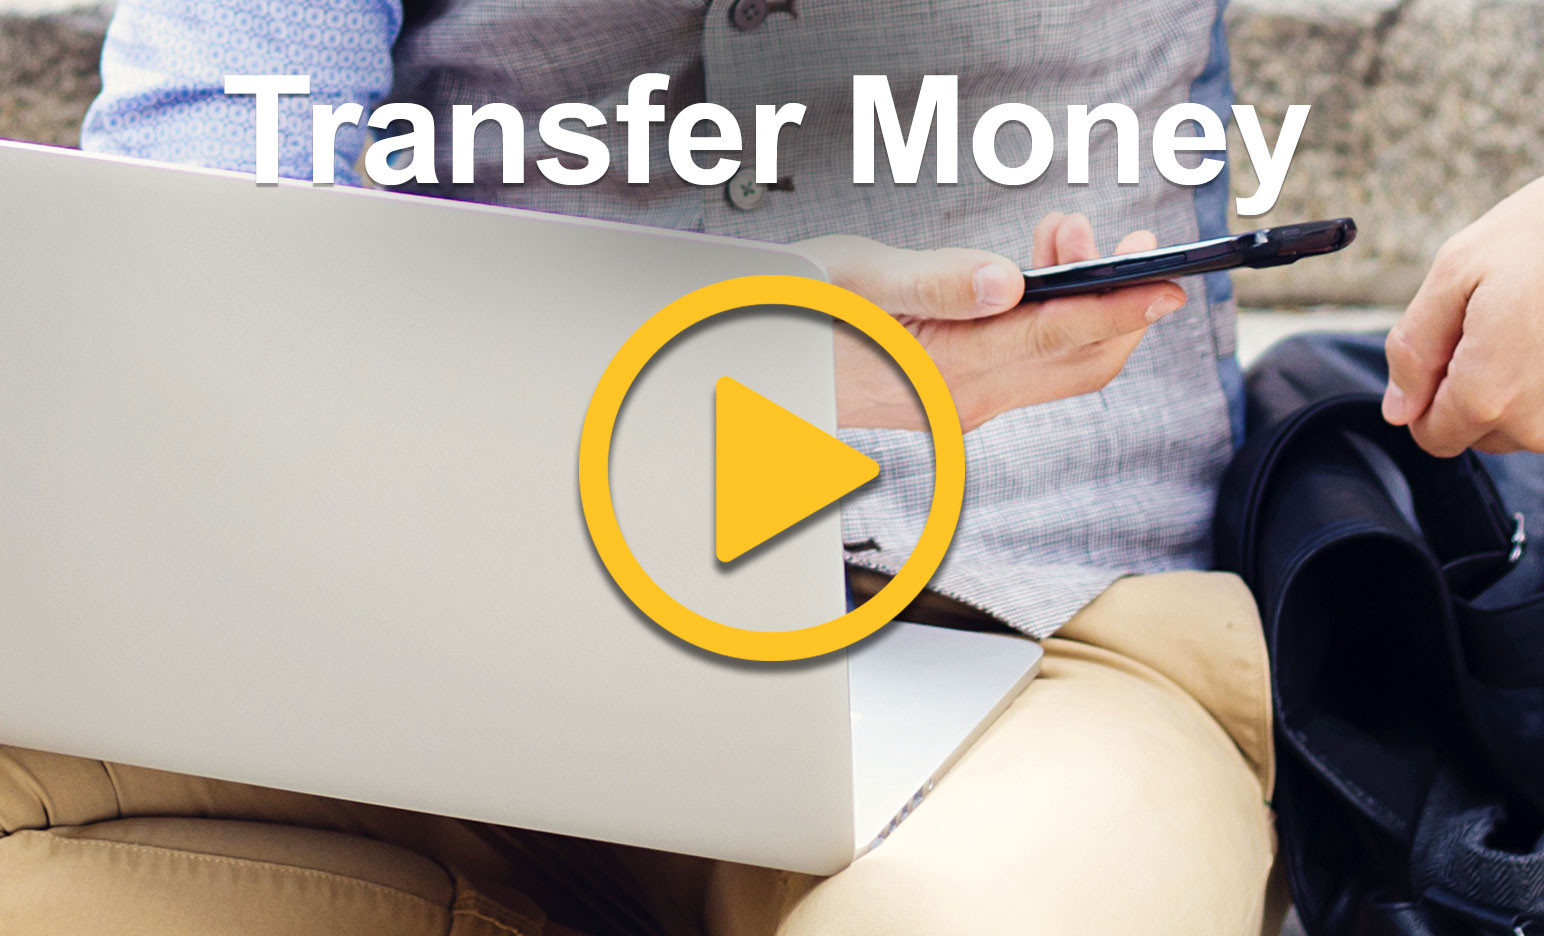 Transfer Money Demo